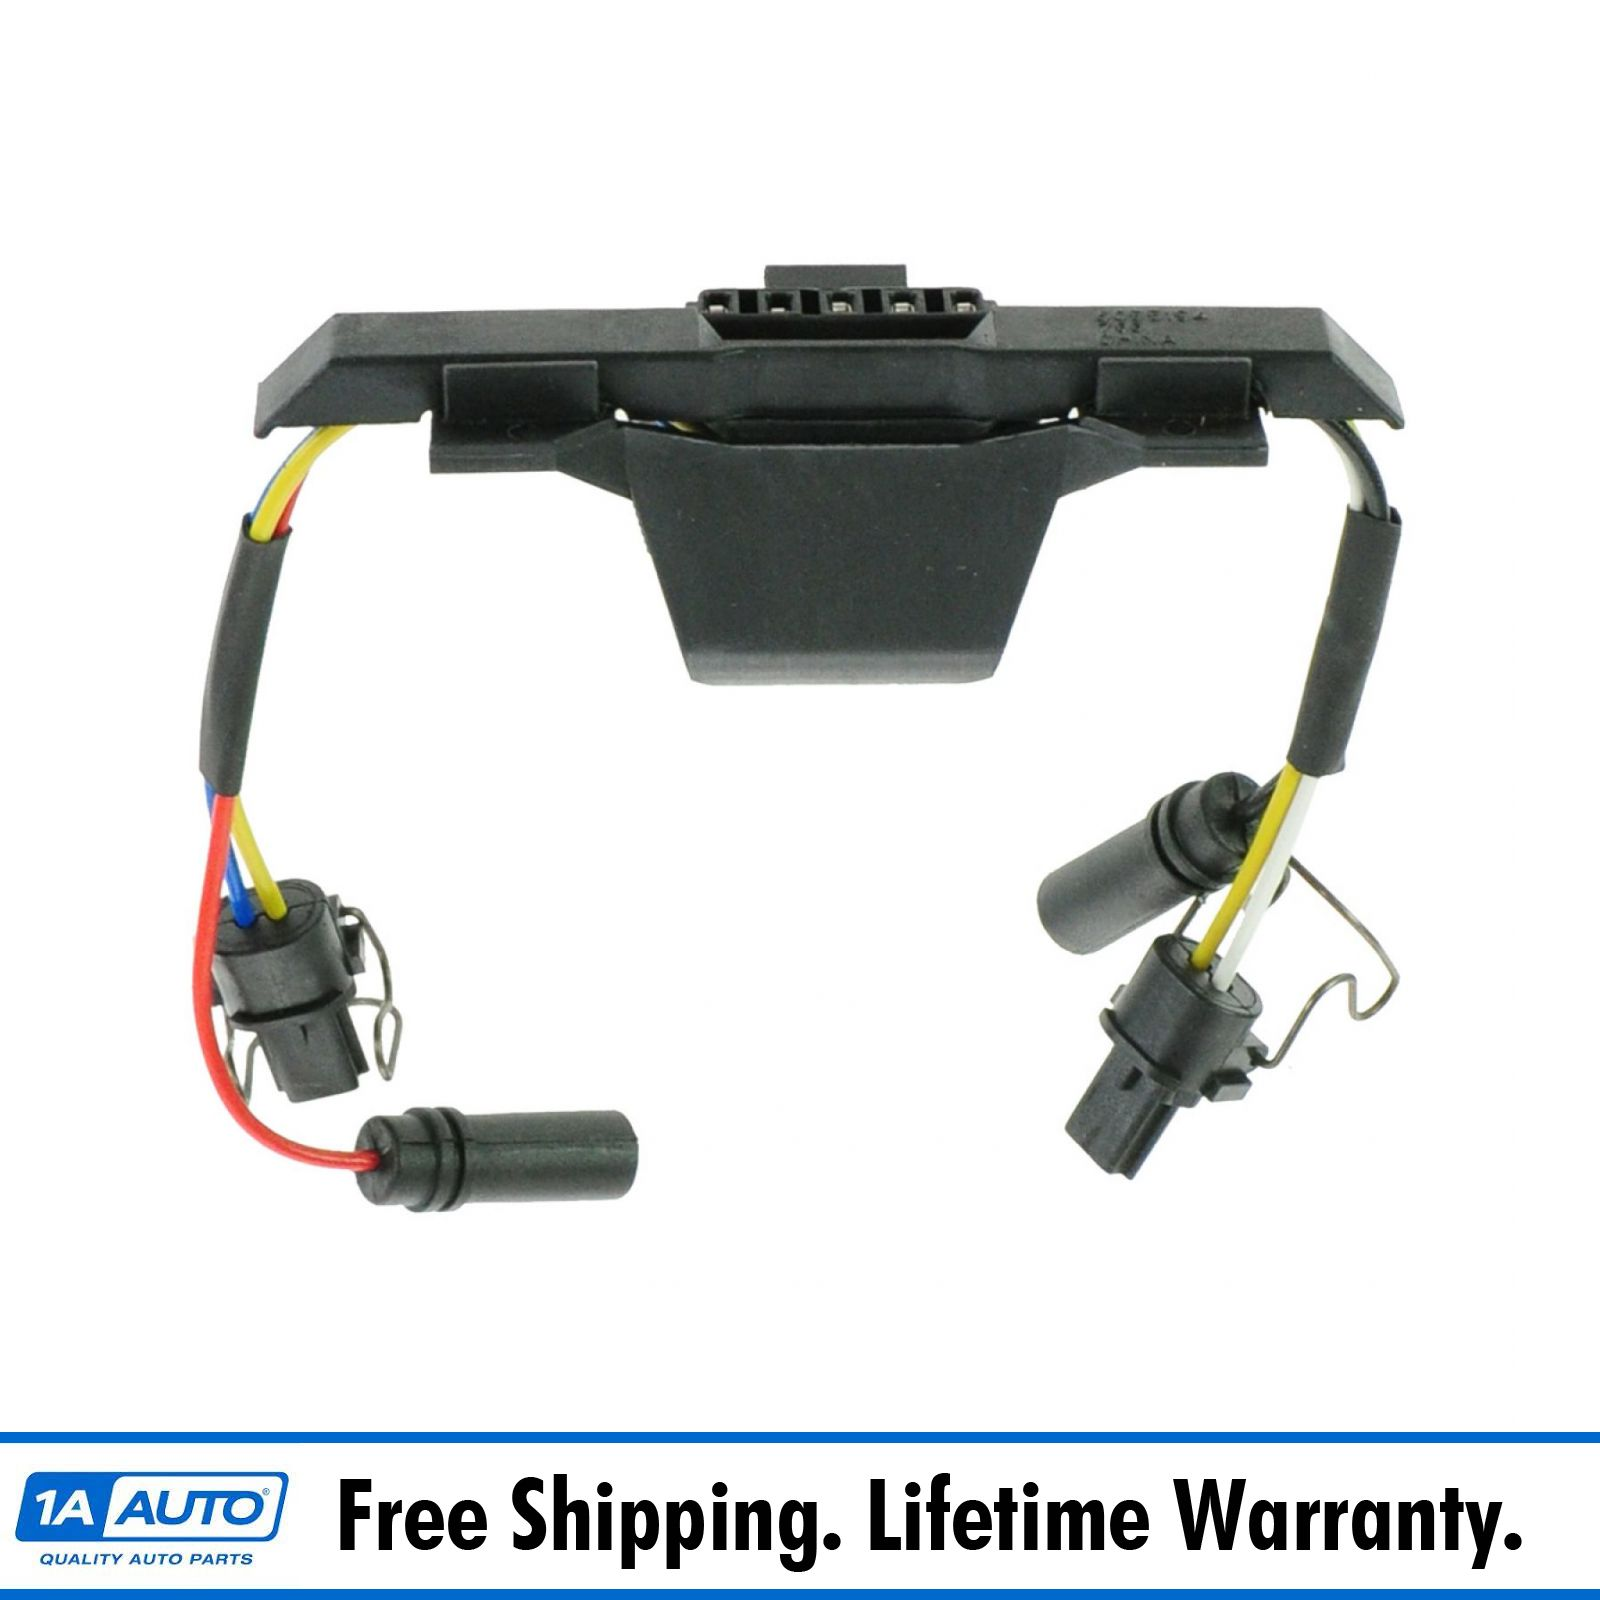 Ford Van Truck Fuel Injector Harness &Glow Plug Harness